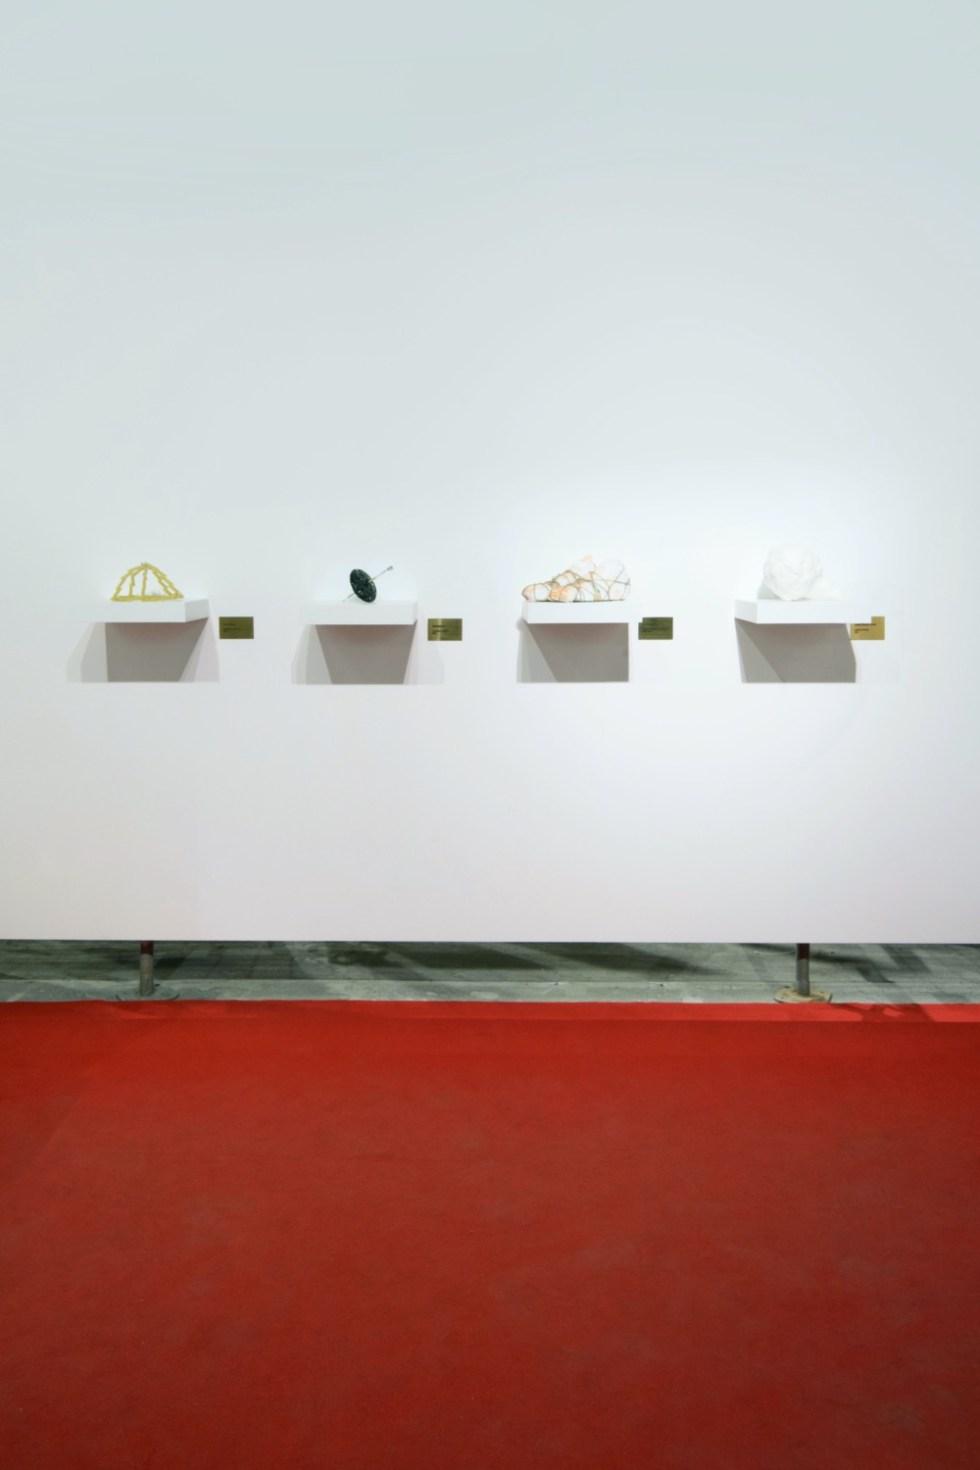 Андрей Ишонин, «4276 3801 7326 7720 Сбер», 2020. Виды экспозиции. Фото Кристина Матвеева.